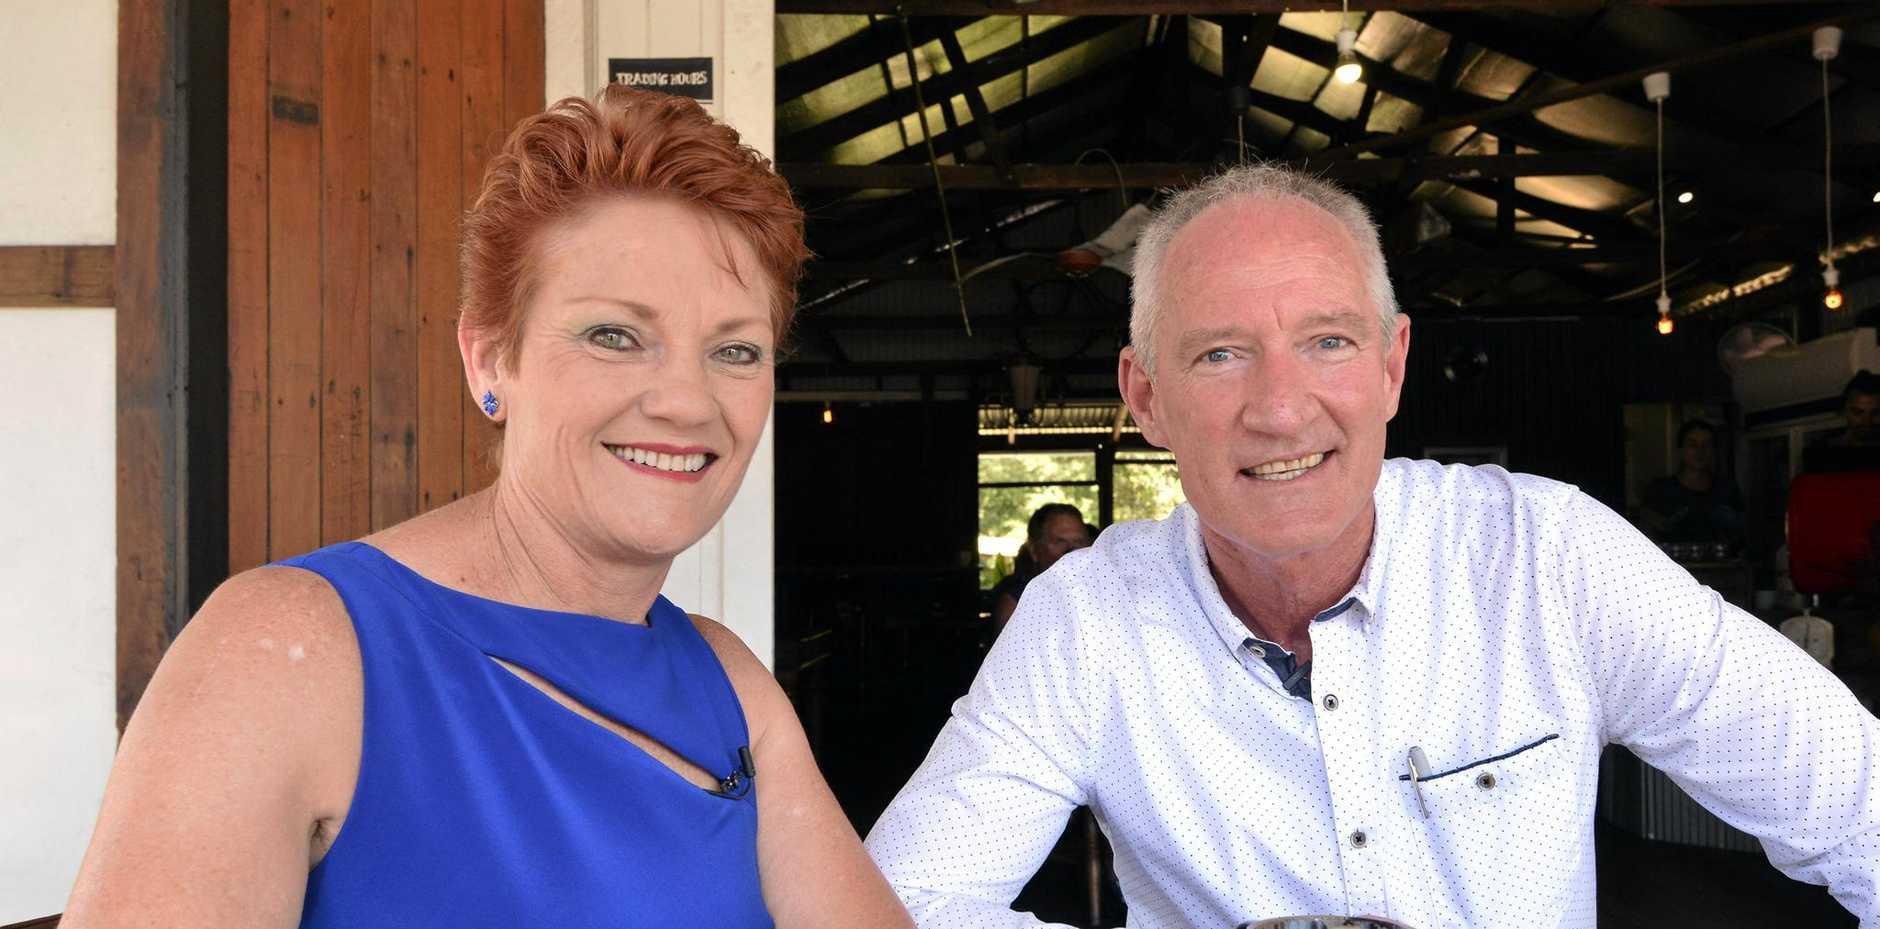 CHALLENGE: Pauline Hanson's One Nation Party leader Senator Pauline Hanson with state leader Steve Dickson, Buderim MP.